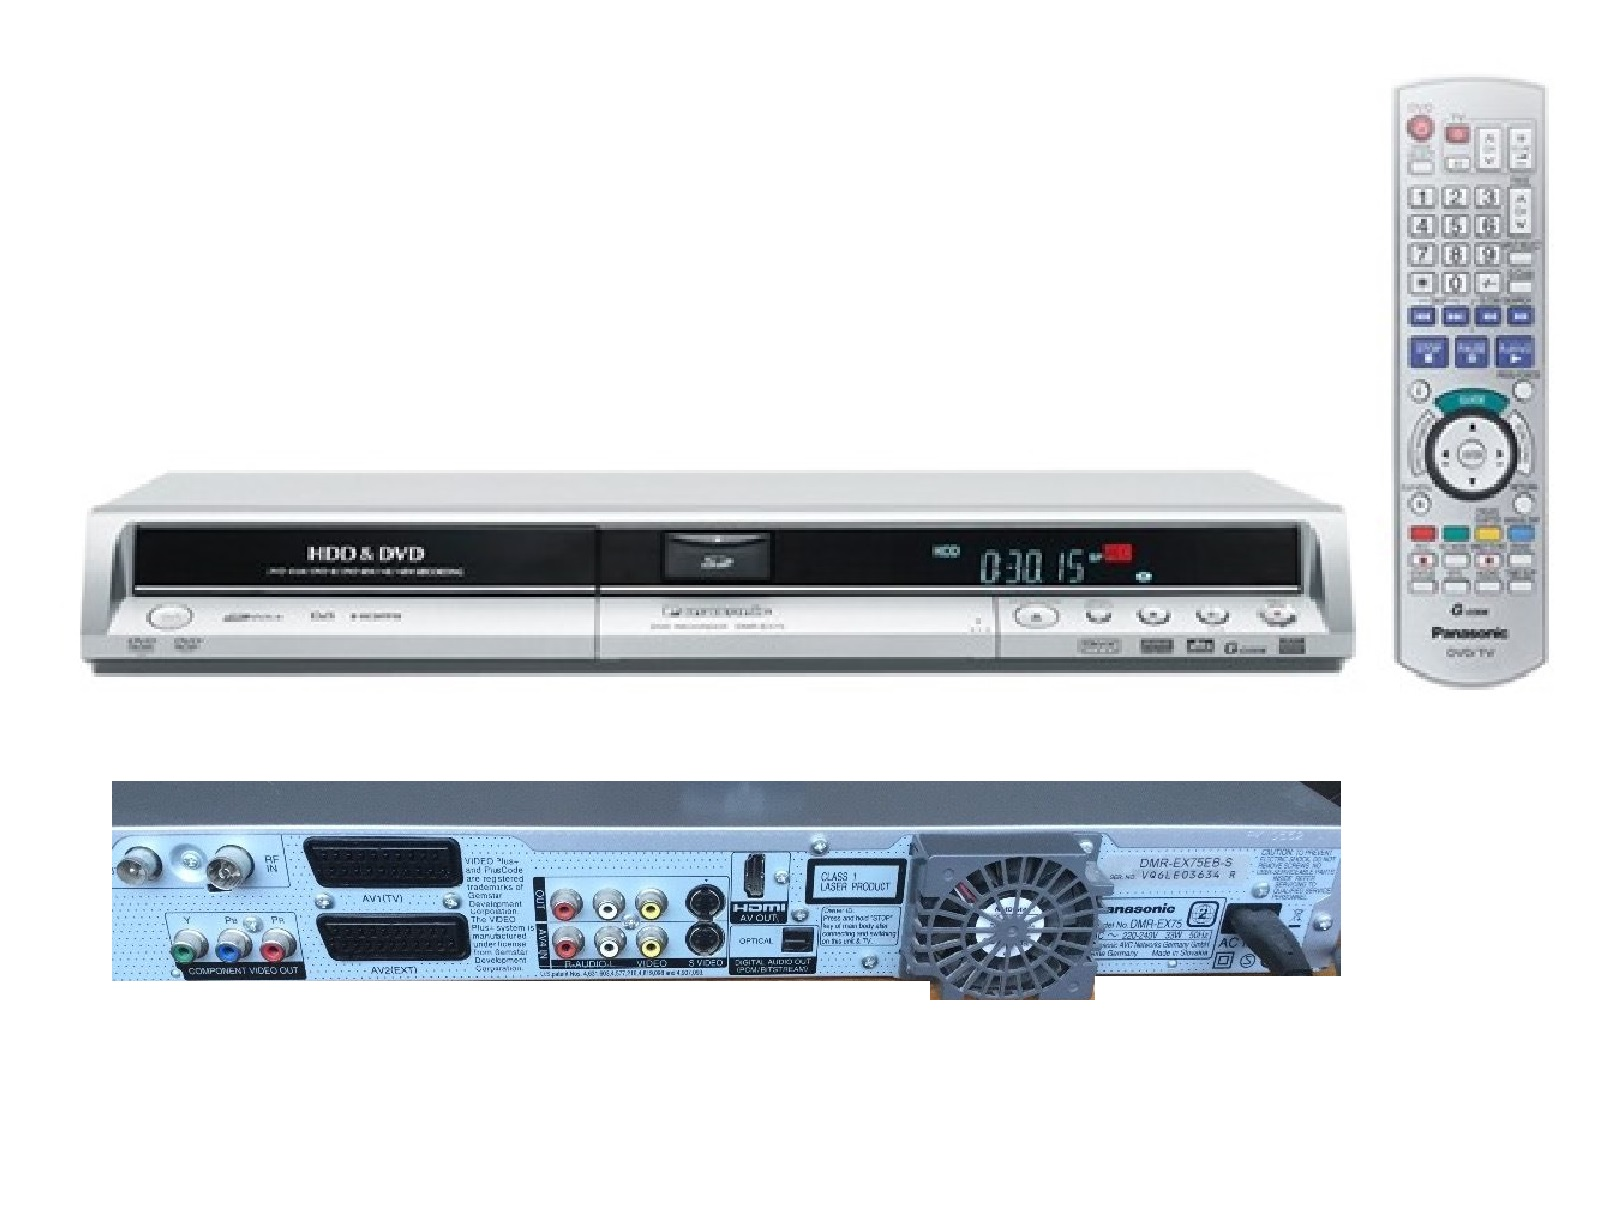 panasonic region free dmr ex85 dvd hdd 250gb recorder hdmi freeview rh ebay ie Panasonic DVD VHS Recorder Manual Panasonic Remotes for DVD and VHS Recorder